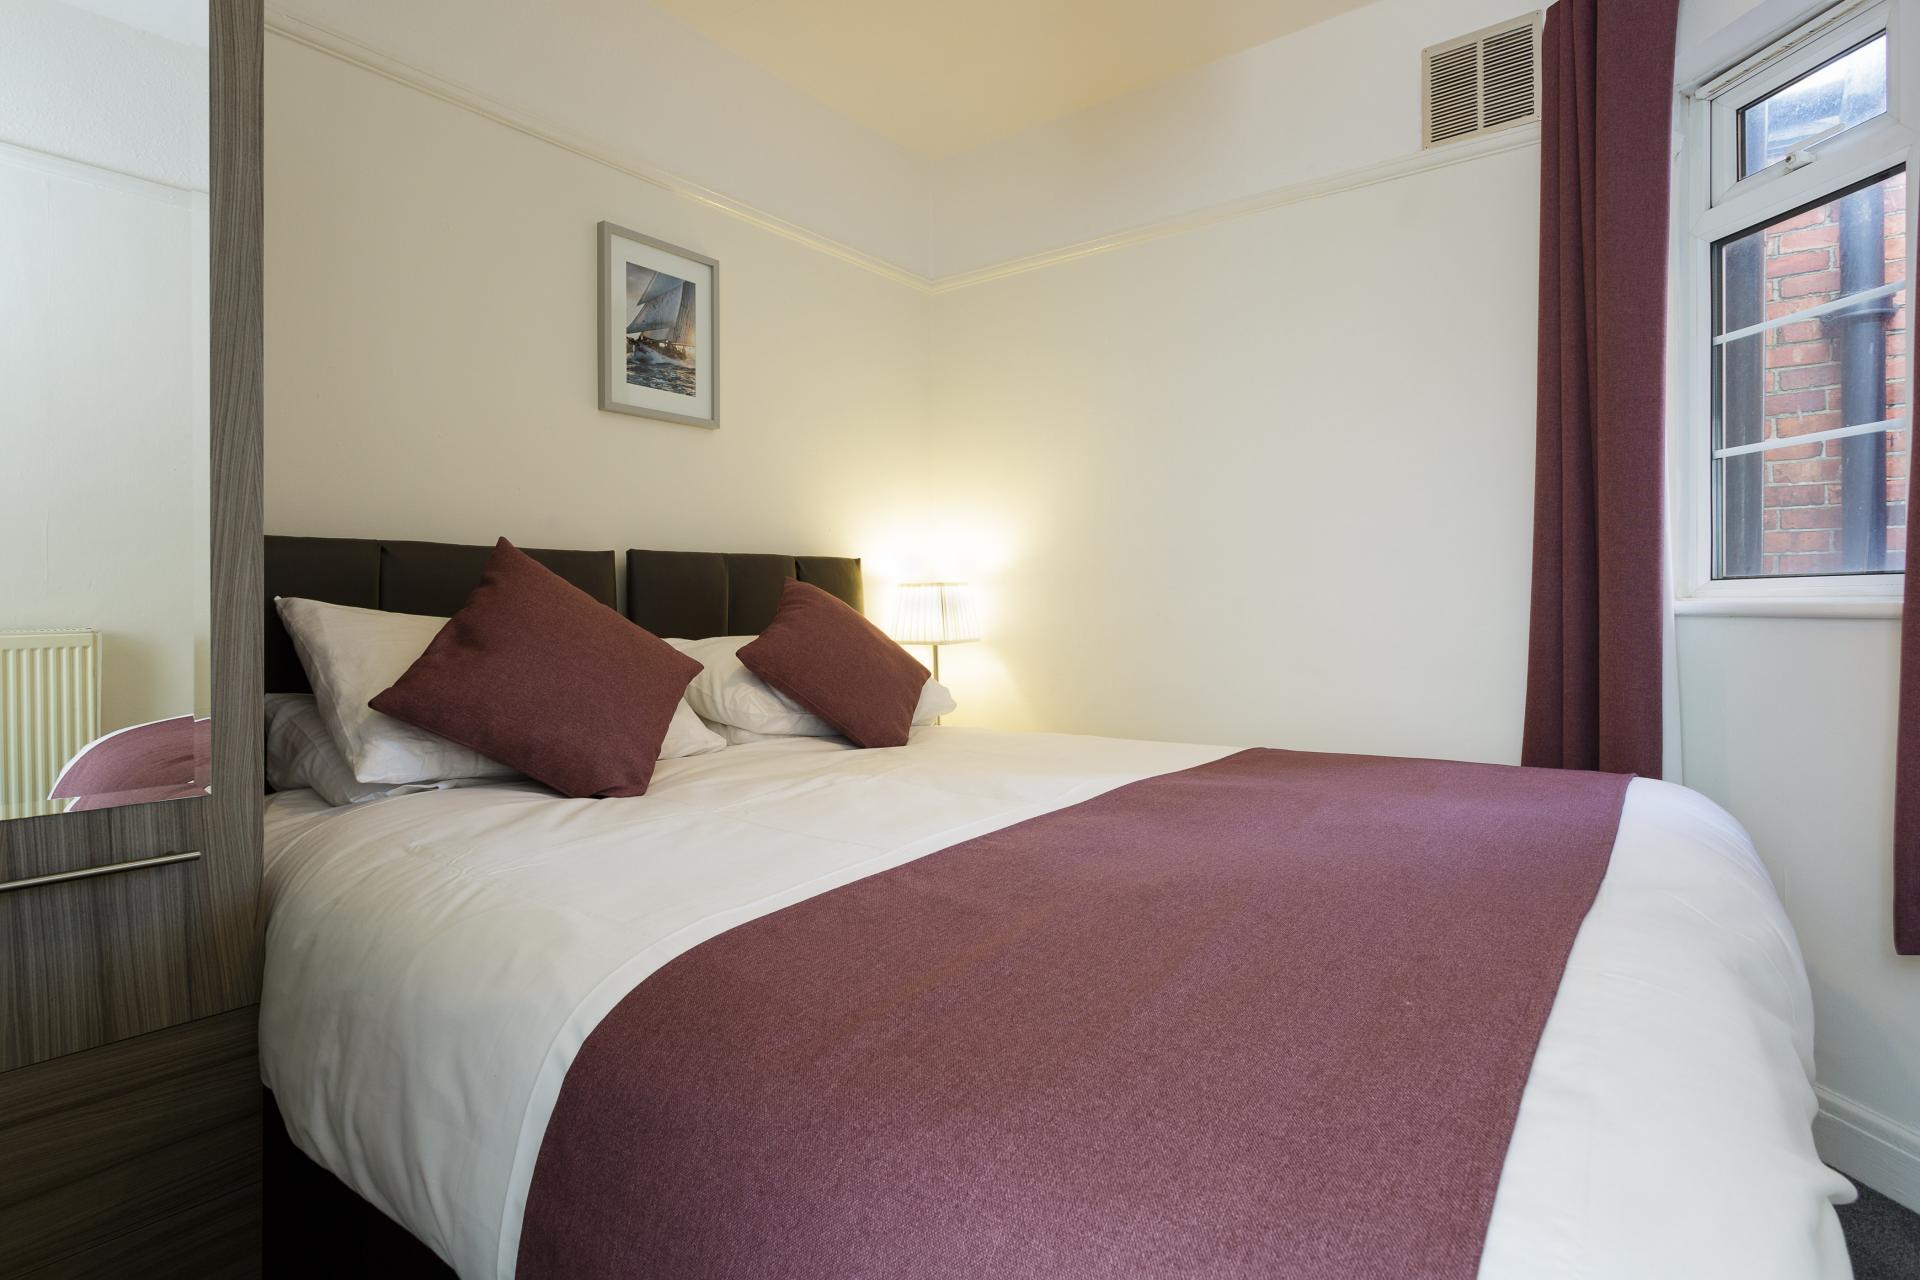 Bedroom at Braganza House Apartments, Old Portsmouth, Portsmouth - Citybase Apartments